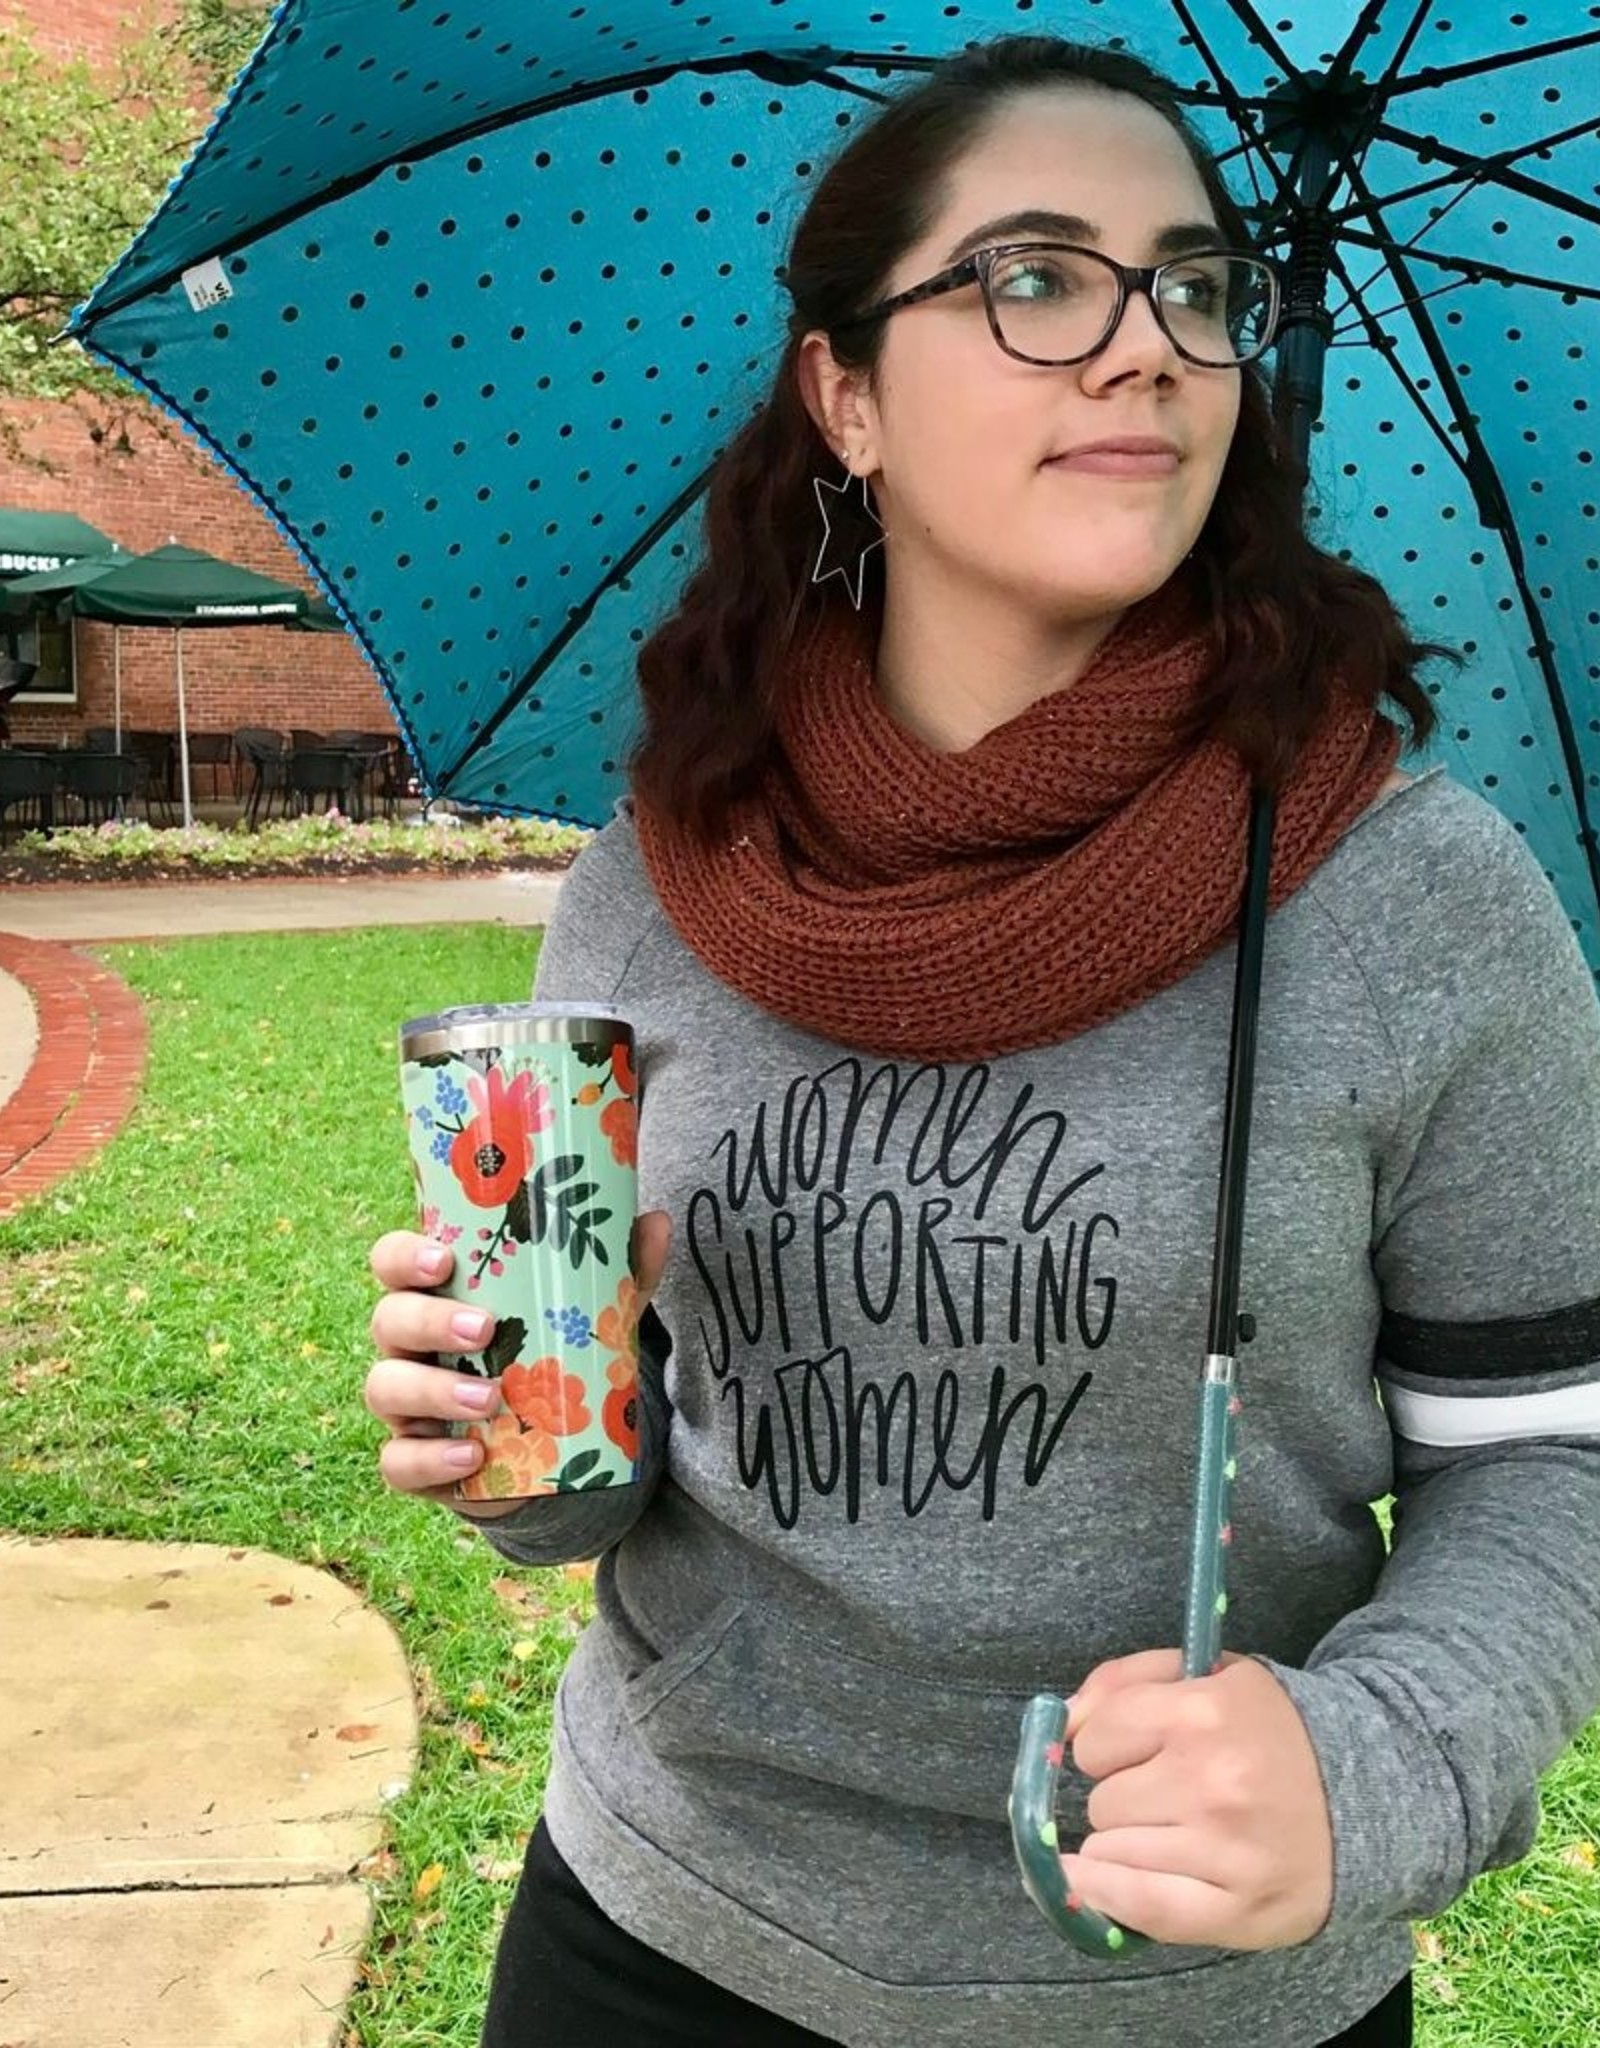 SUNDAY AFTERNOON HOUSEWIFE Women Supporting Women Sweatshirt